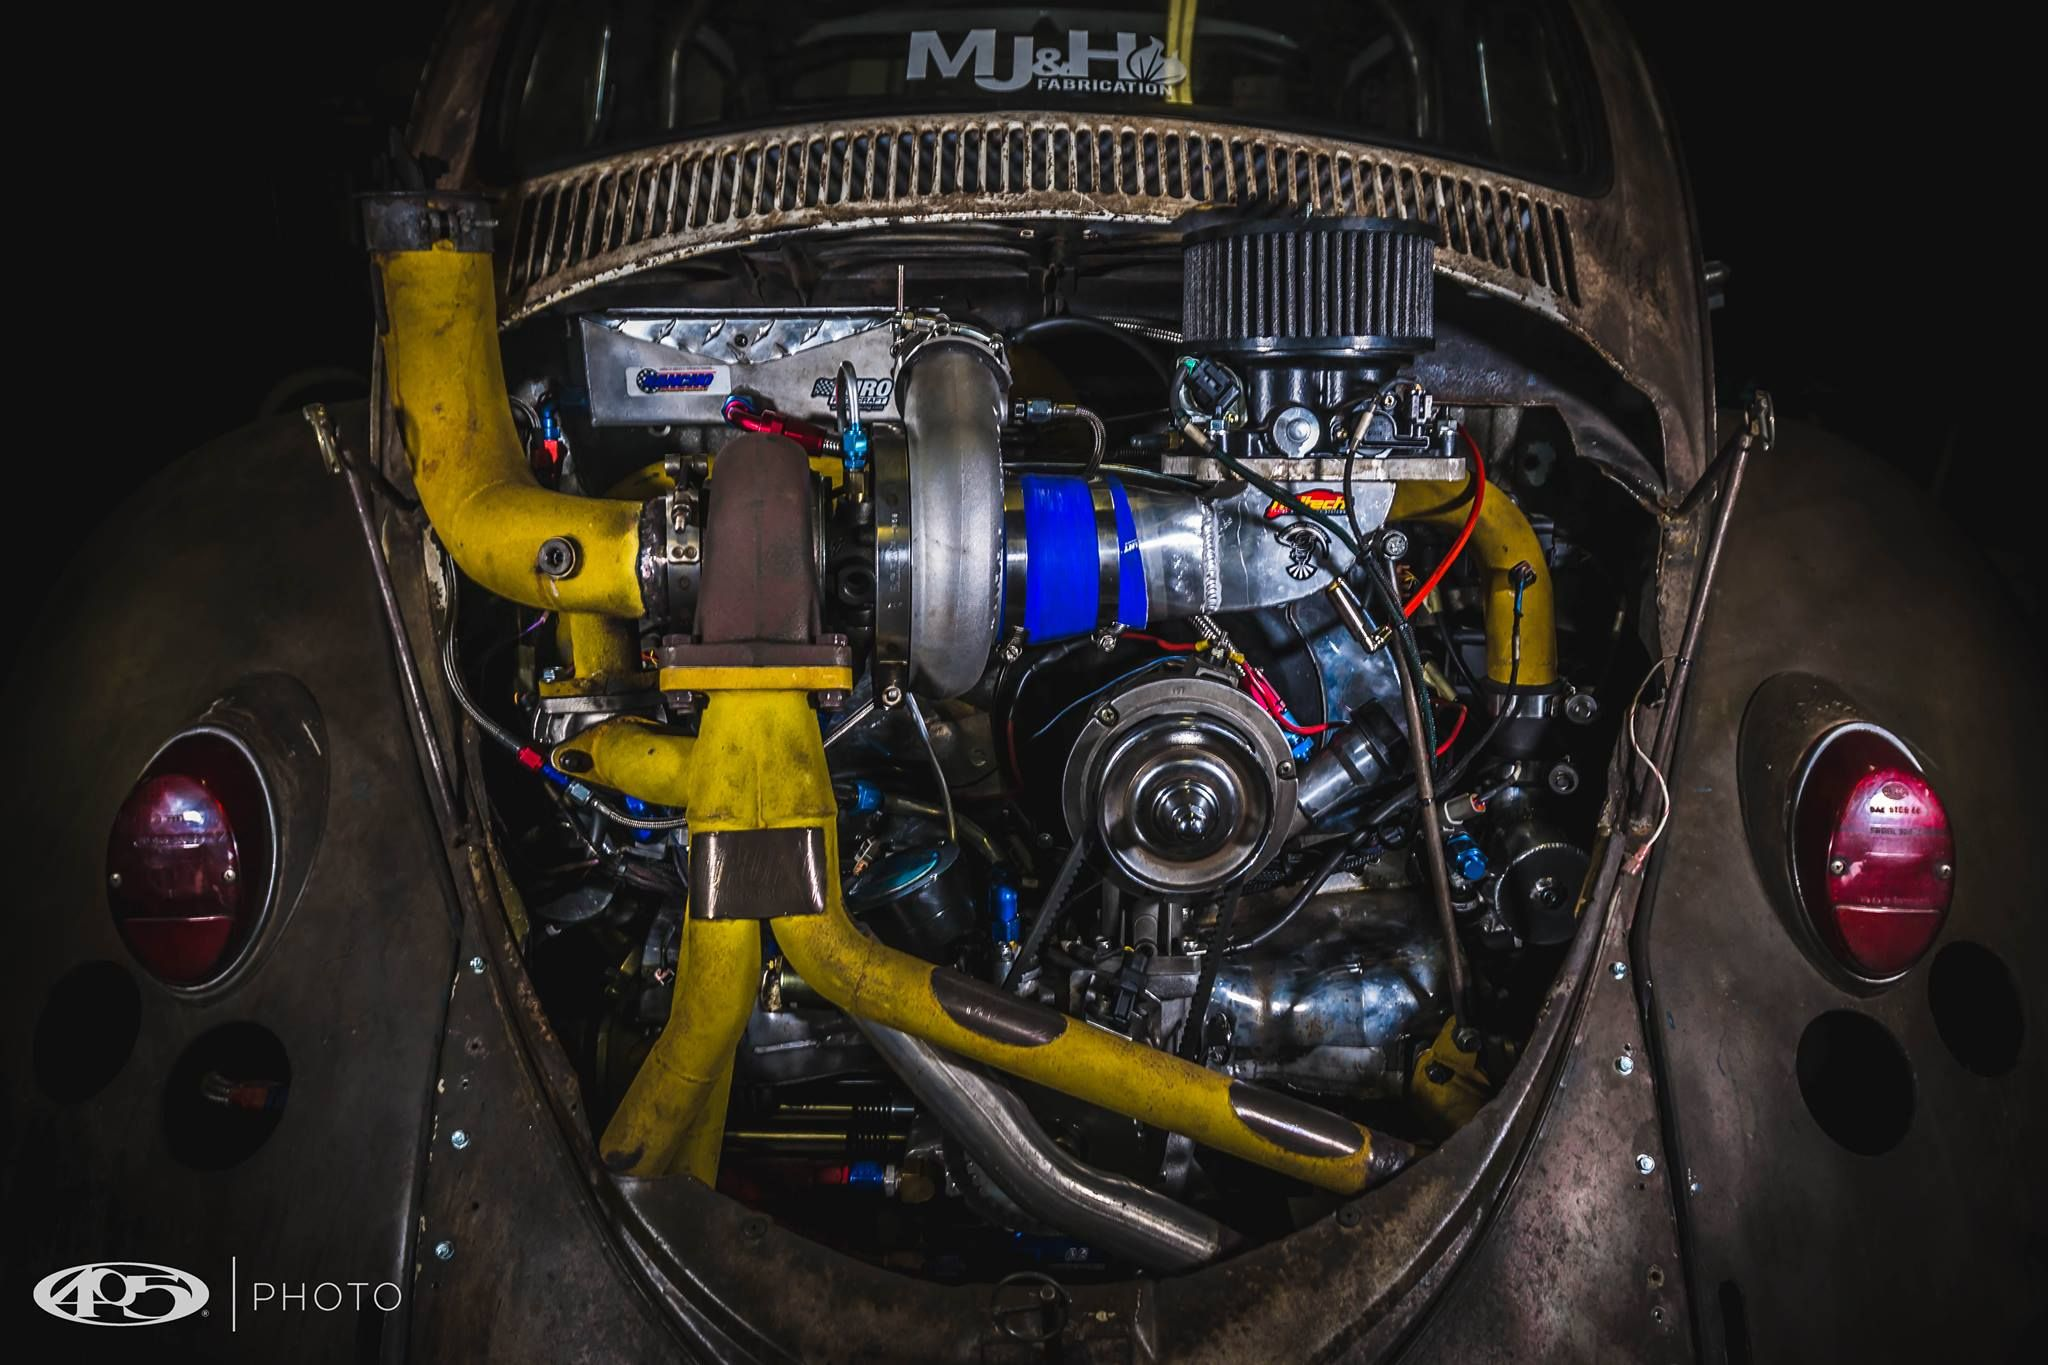 2332cc Vw Dung Beetle Engine